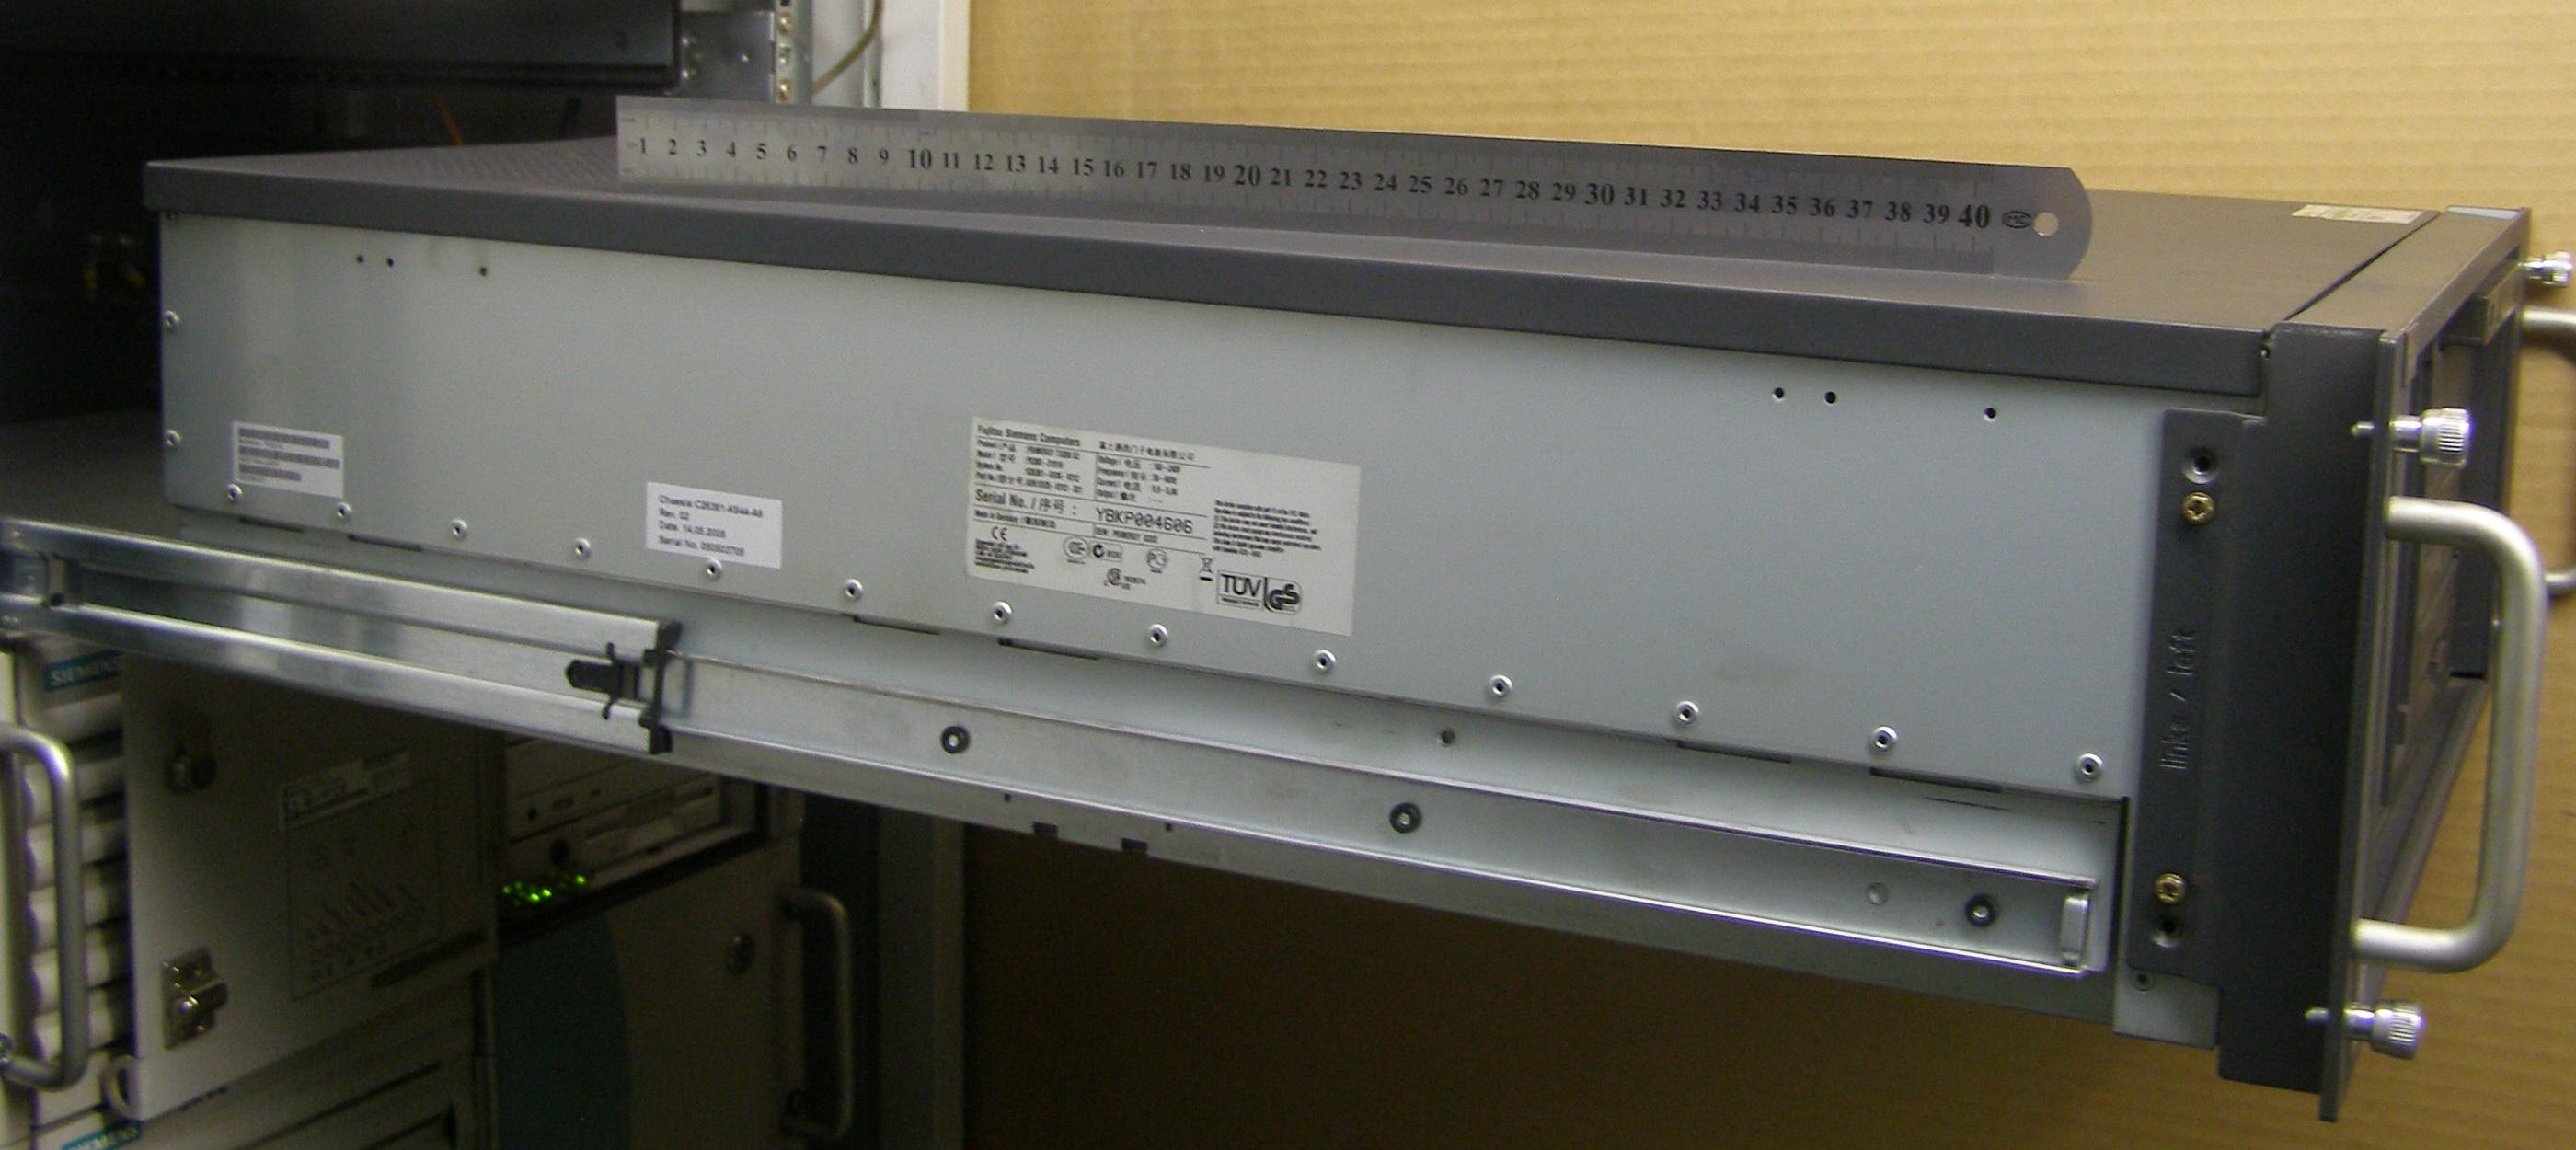 https commons wikimedia org wiki file fujitsu siemens 19inch rack rail system 20100621 jpg